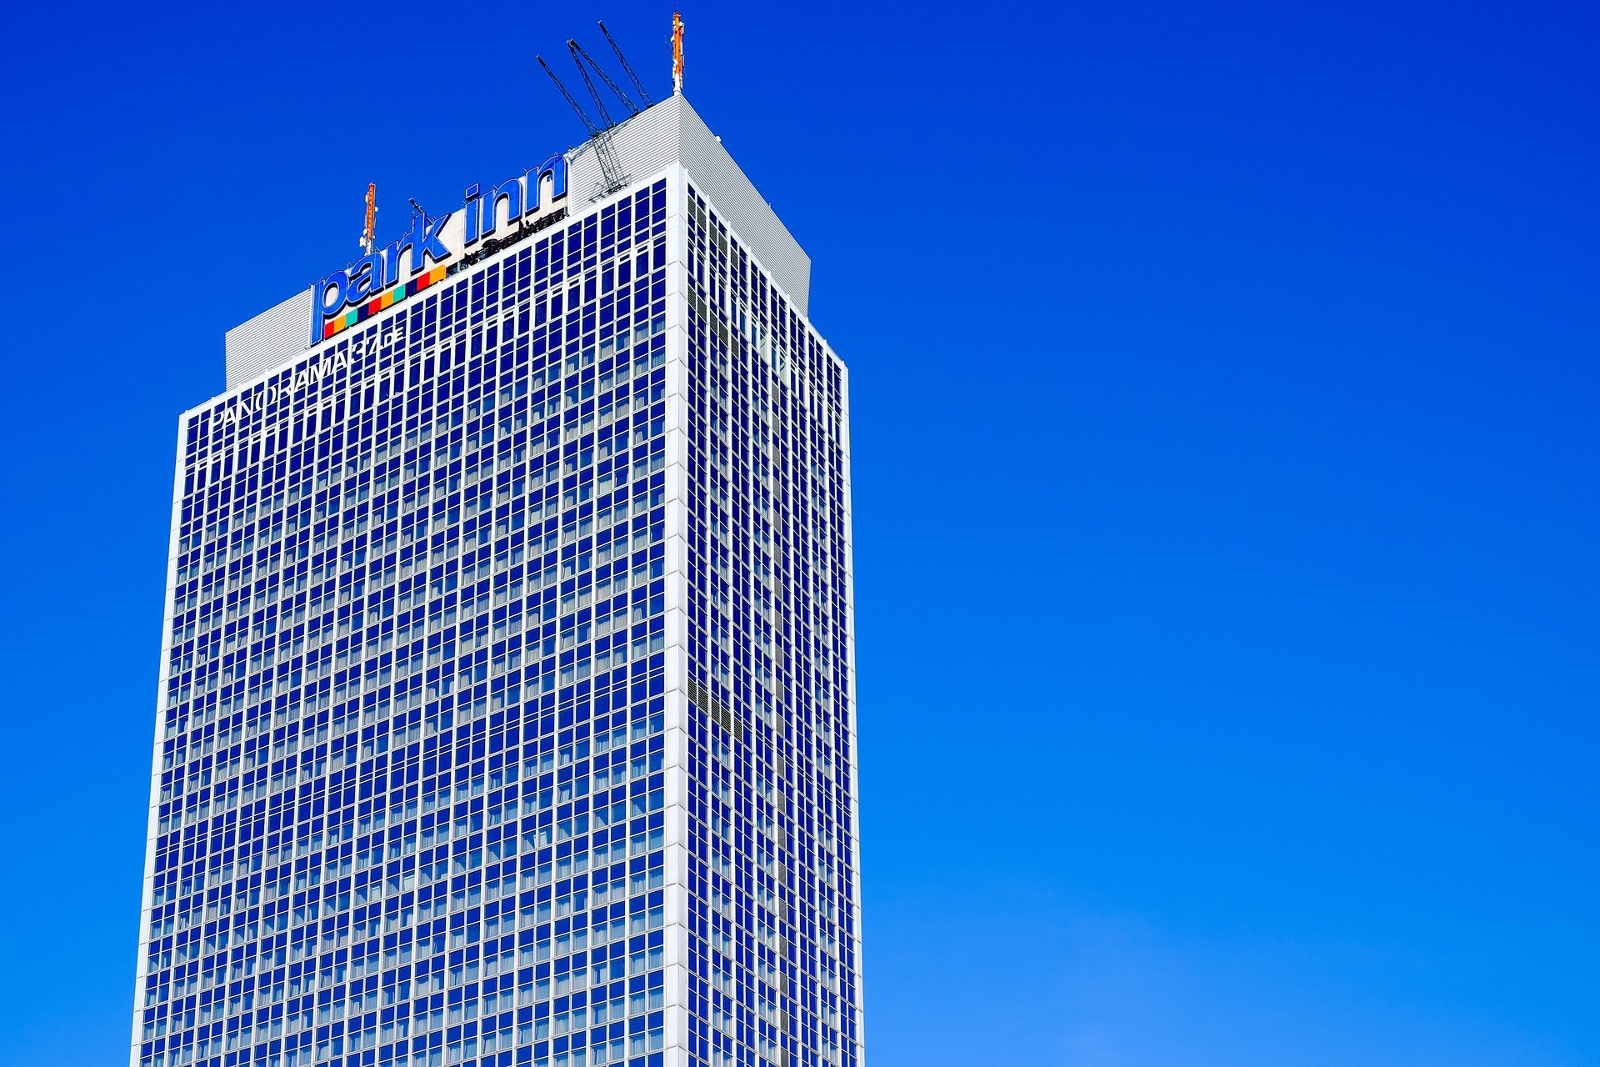 20% Rabatt bei Radisson Hotelbuchungen plus 15€ Shoop.de-Gutschein